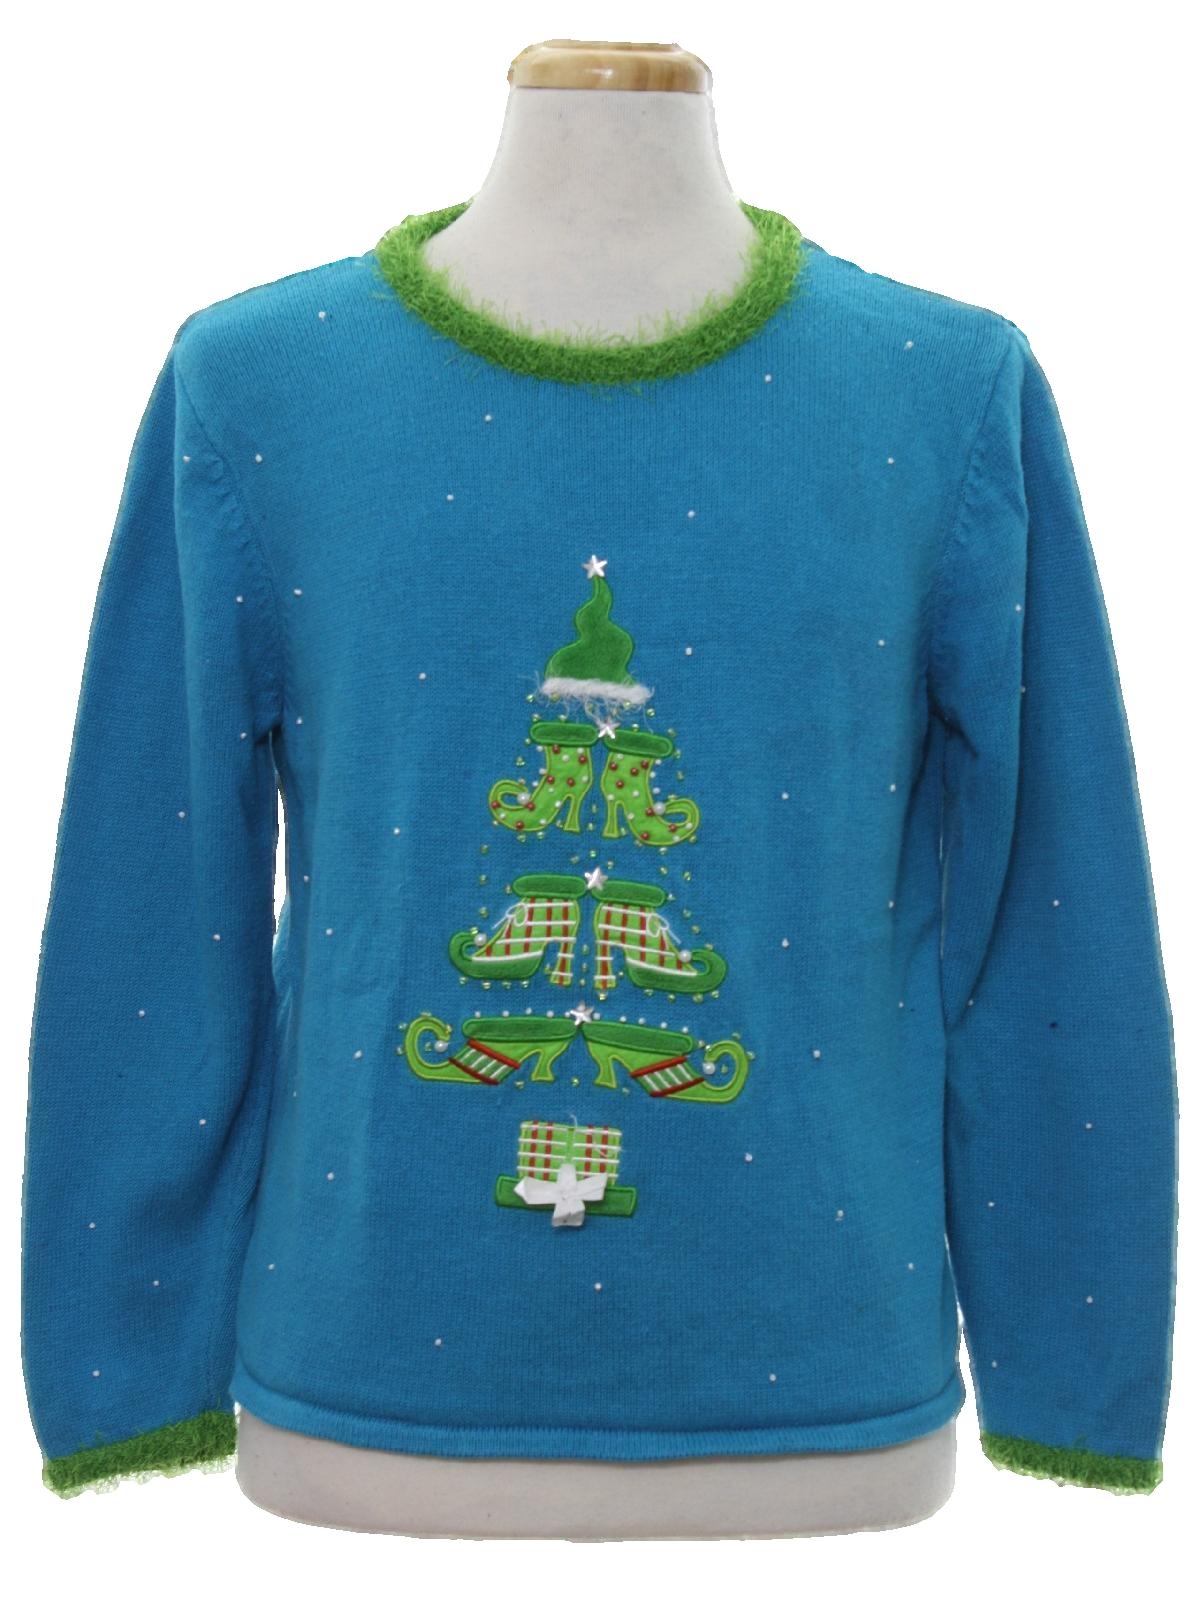 Ugly christmas sweater mandal bay unisex aqua blue for Over the top ugly christmas sweaters